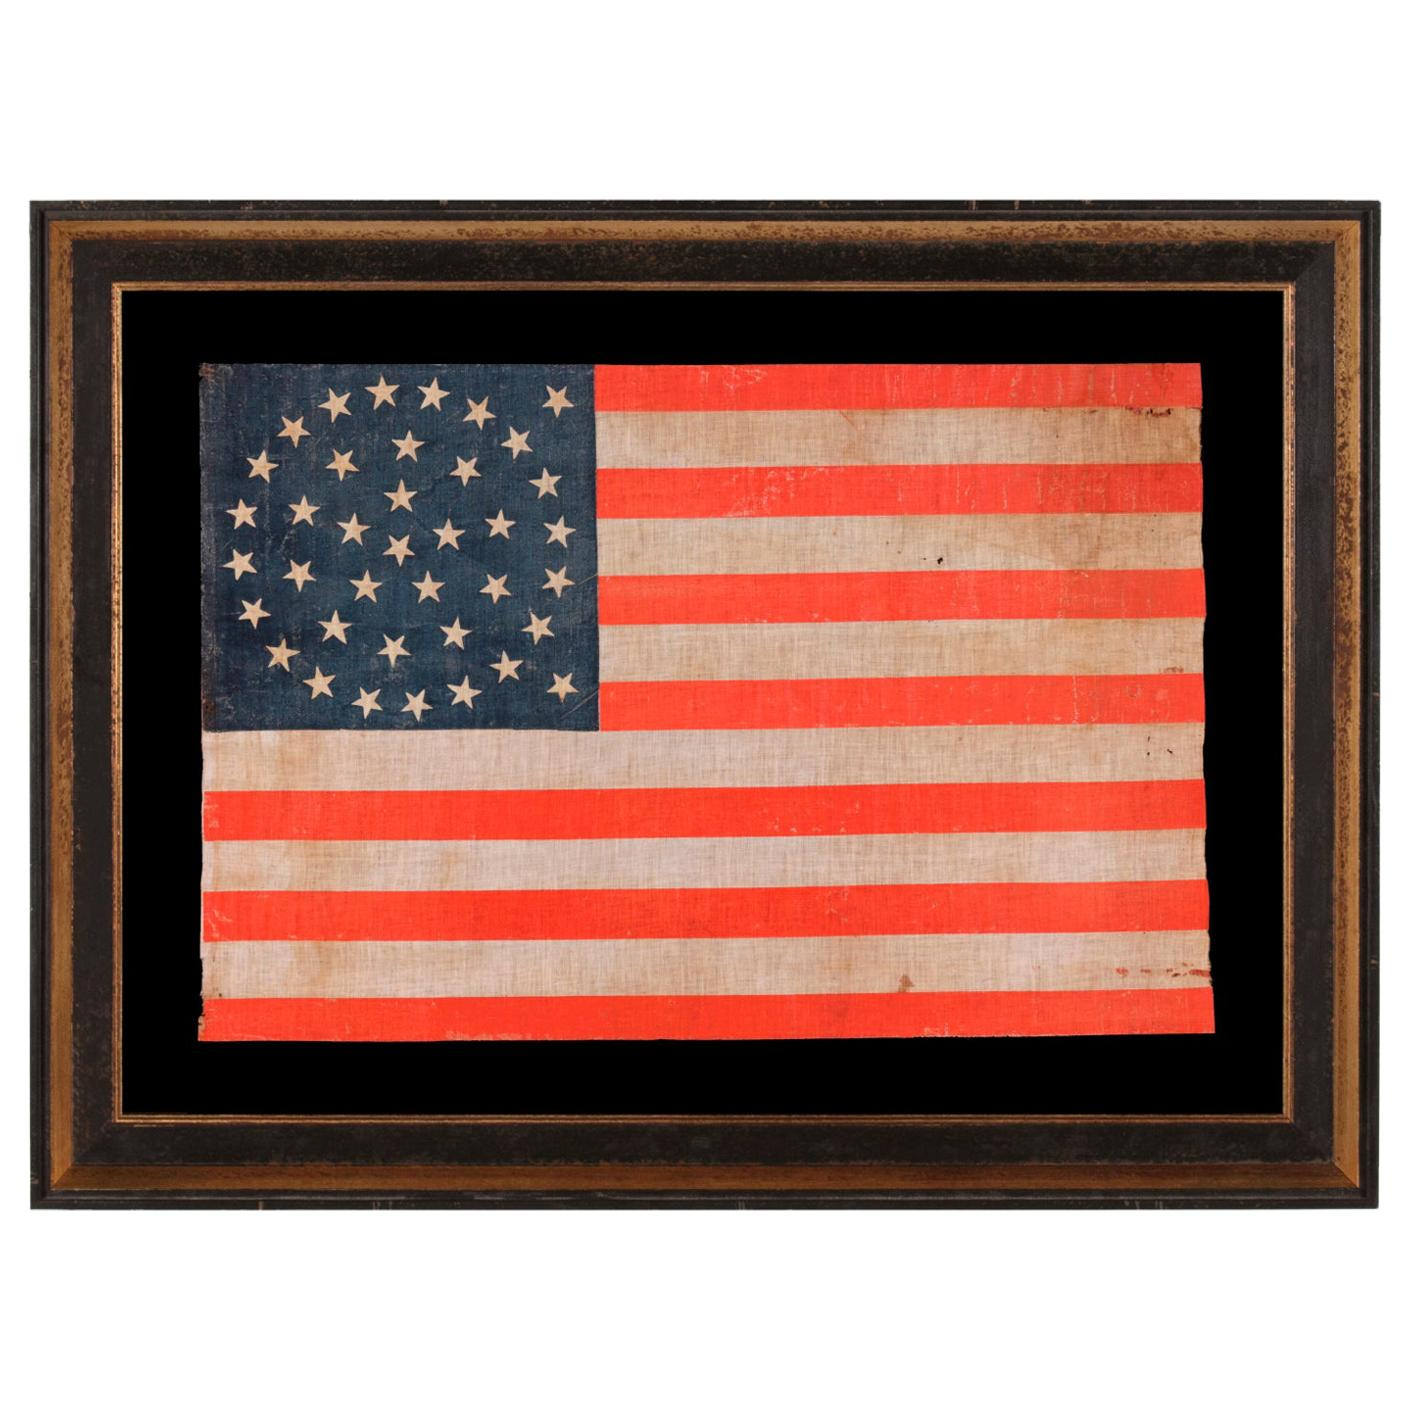 38 Star American Parade Flag, Medallion Pattern, Colorado Statehood, 1876-1889